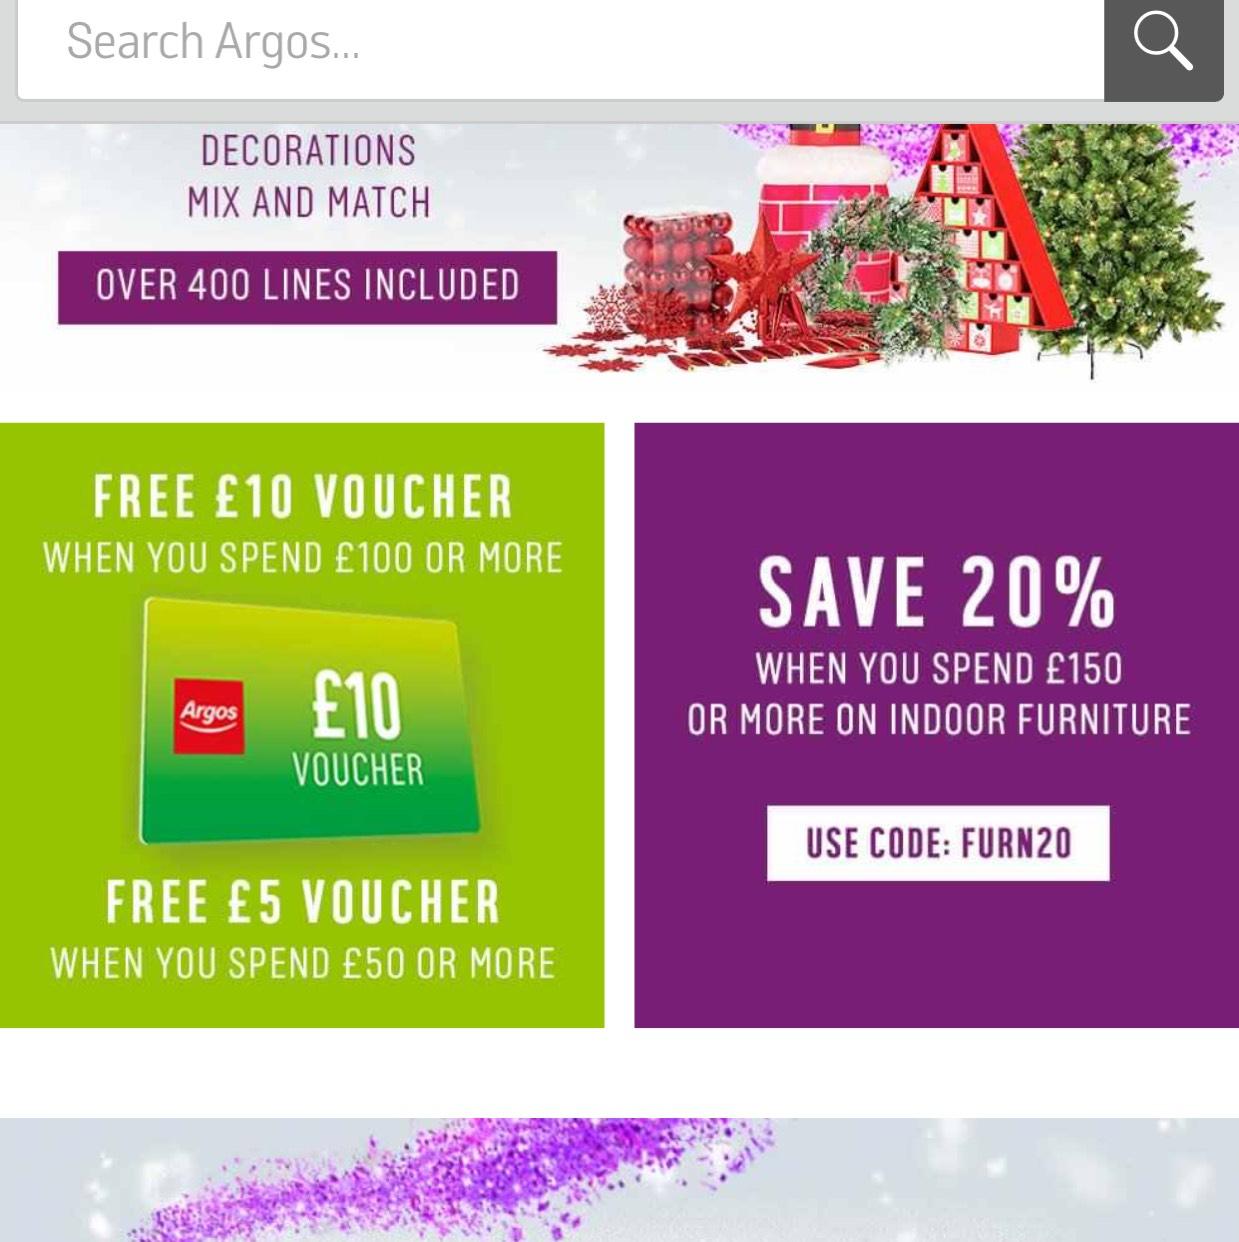 20% off all indoor furniture at Argos and £10 voucher